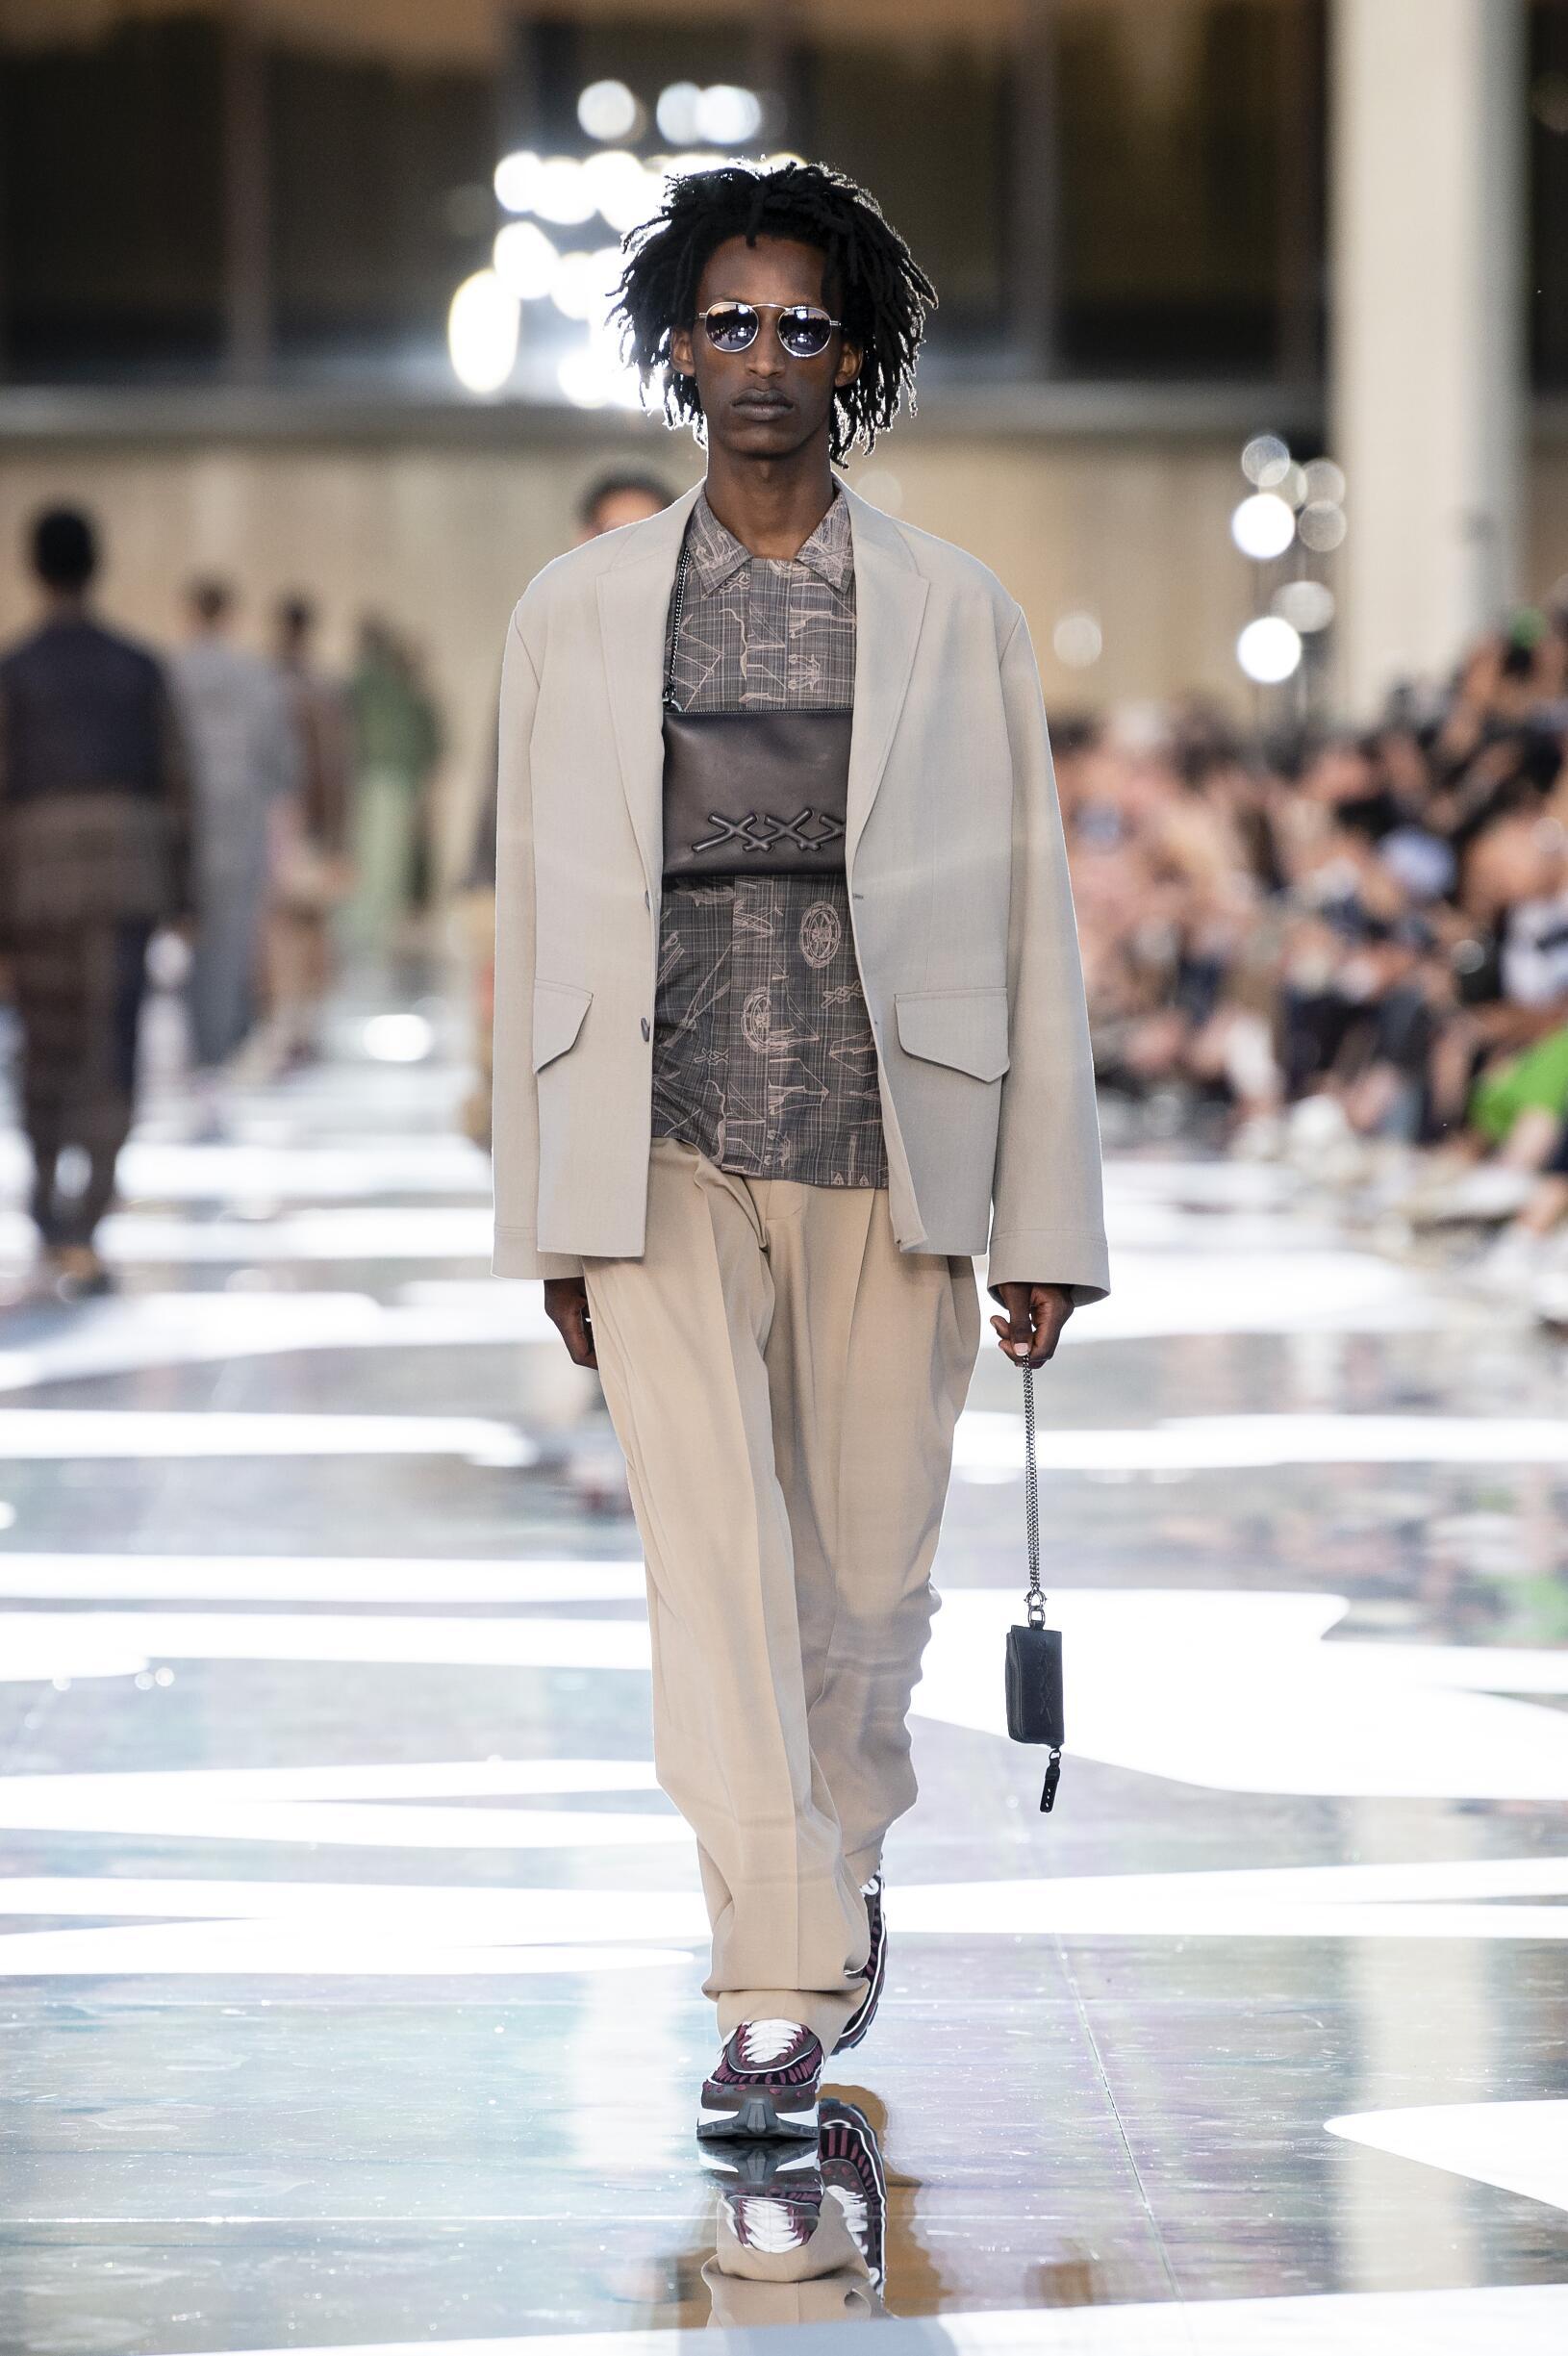 Runway Ermenegildo Zegna Couture Spring Summer 2019 Men's Collection Milan Fashion Week